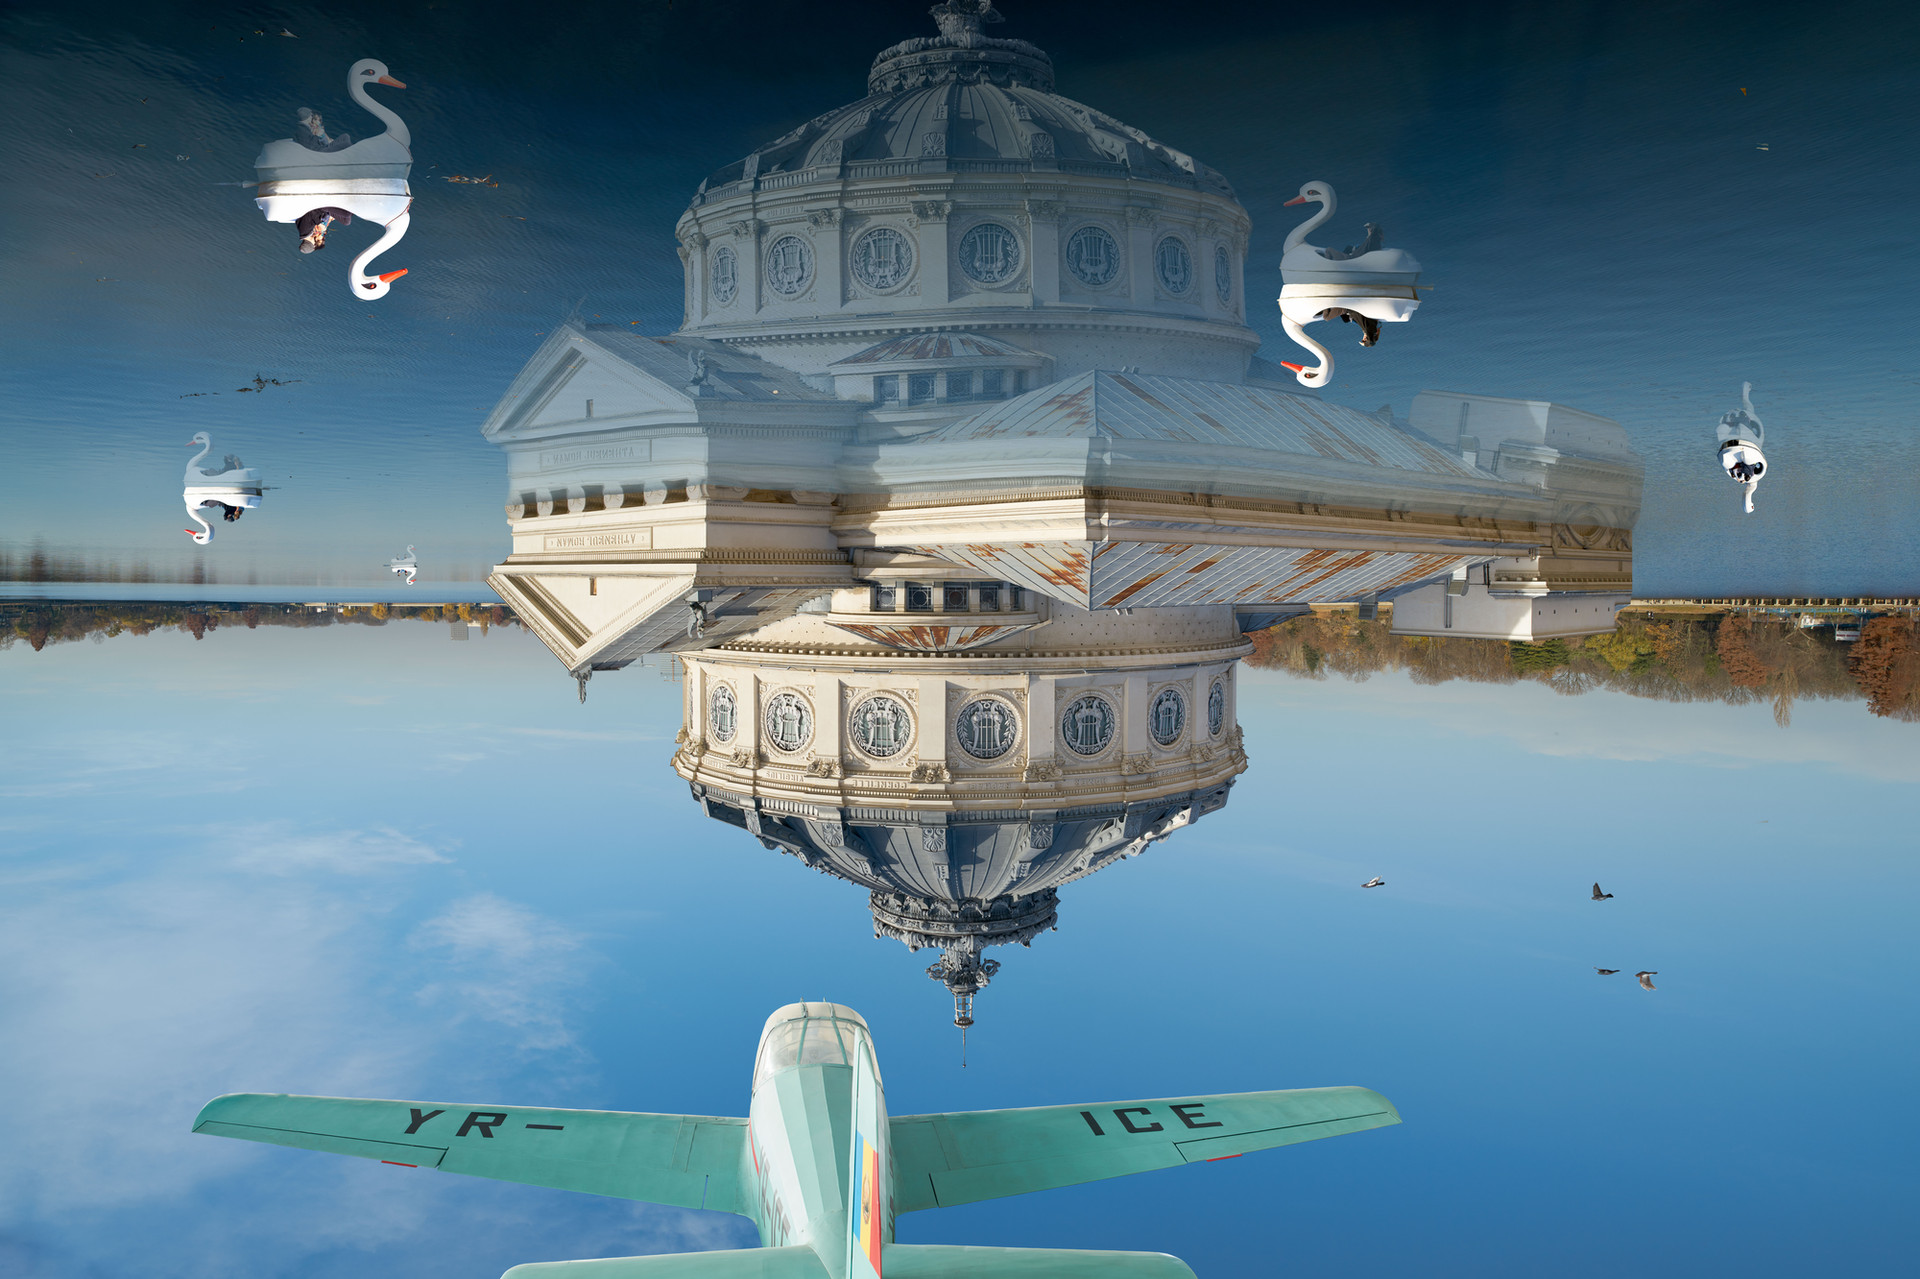 Understanding music - floating reflections of flight